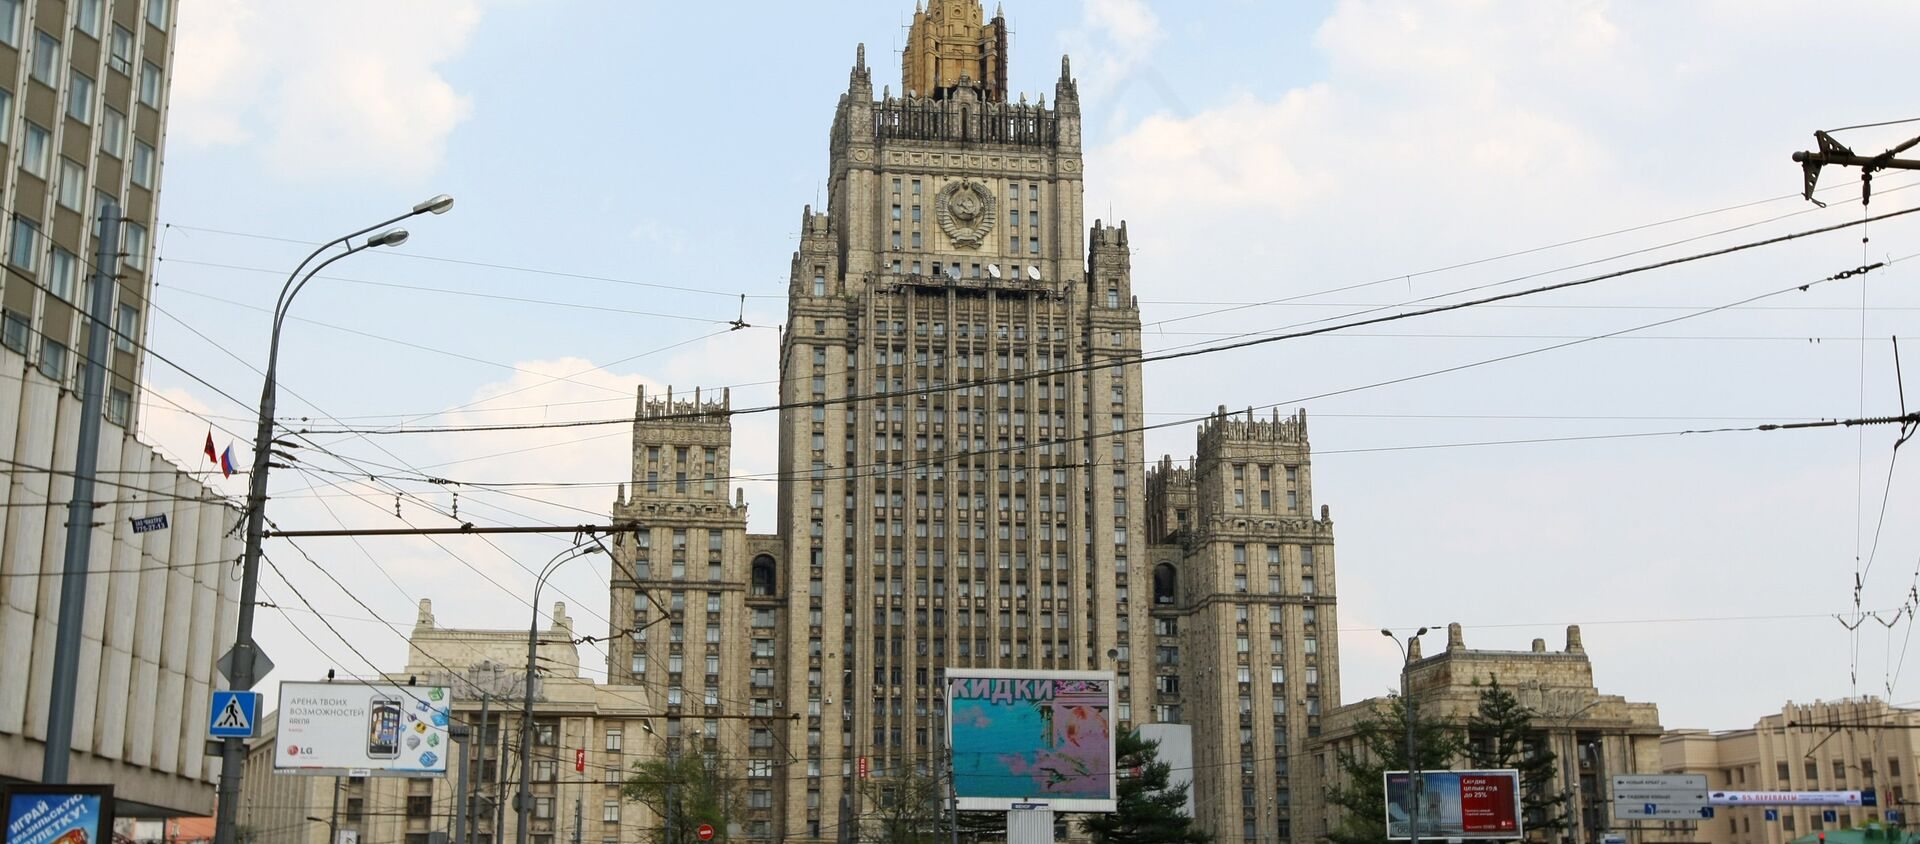 Moskwa, budynek MSZ - Sputnik Polska, 1920, 26.04.2021